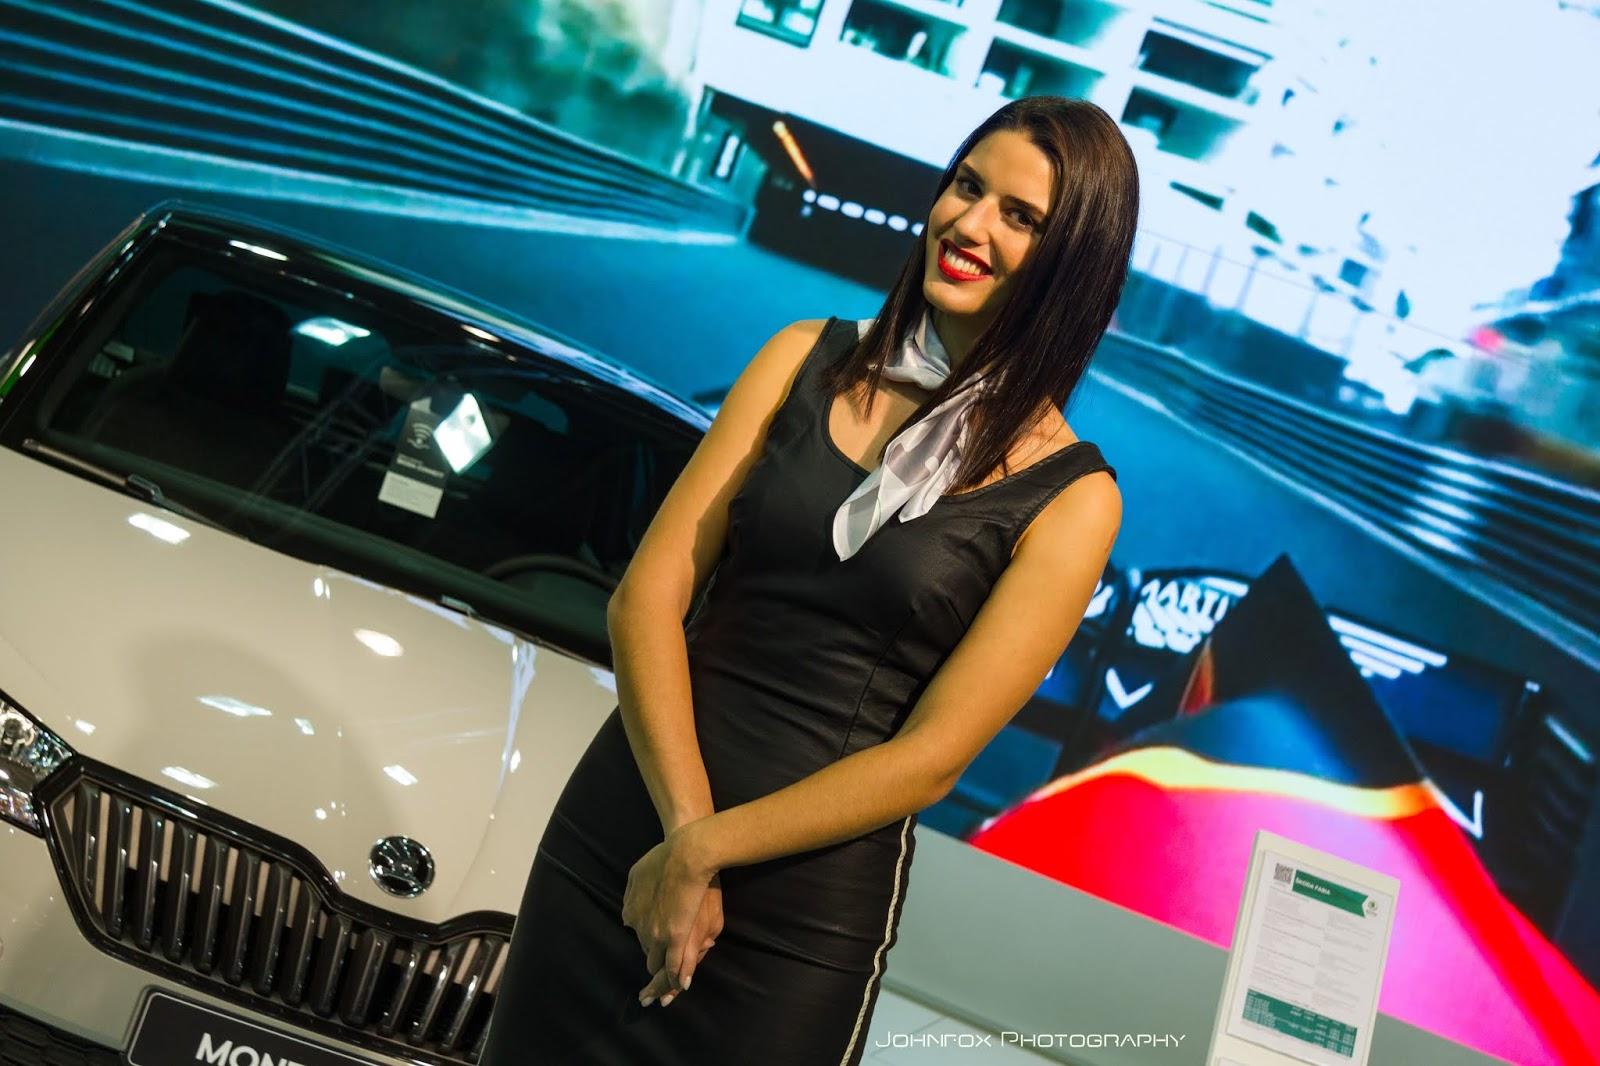 models2B2528152Bof2B232529 Τα κορίτσια της Αυτοκίνησης! Έκθεση, μοντέλα, ΦΩΤΟ, φωτογραφίες